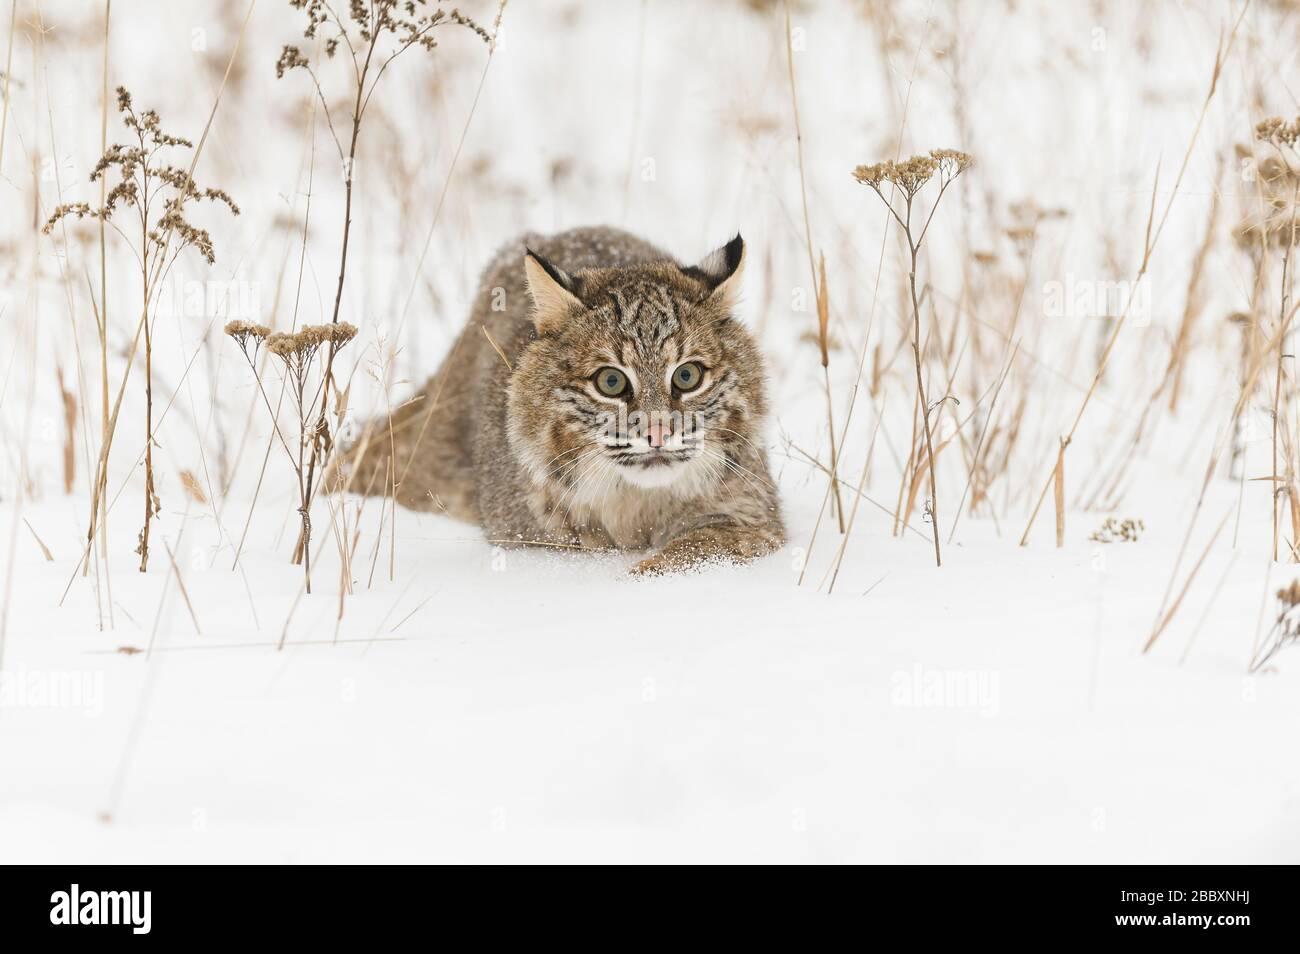 Bobcat stalking, (Lynx rufus), North America, by Dominique Braud/Dembinsky Photo Assoc Stock Photo